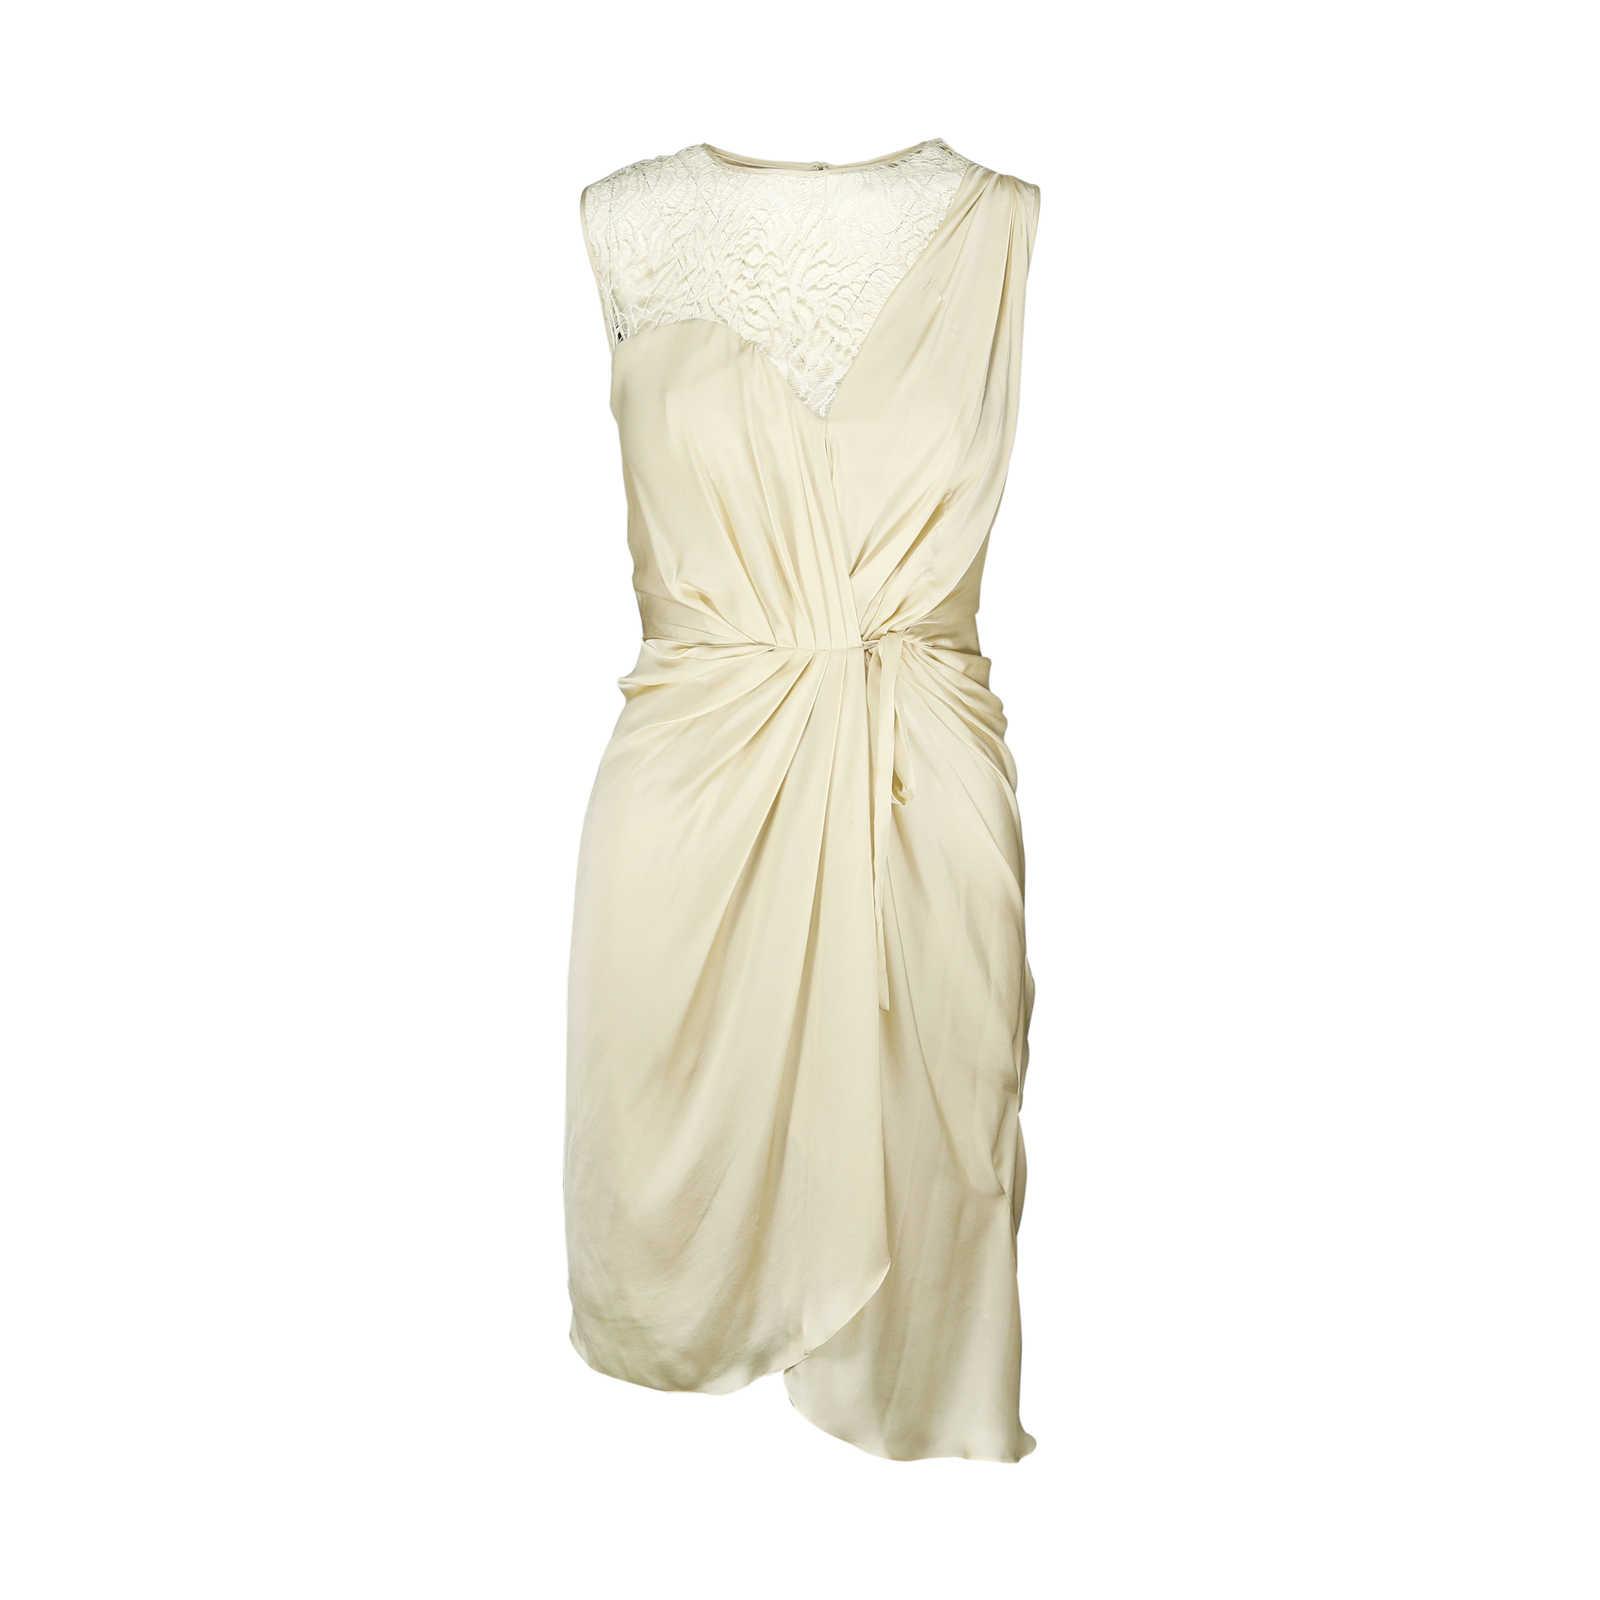 catherine-deane-lace-draped-dress-1.jpg